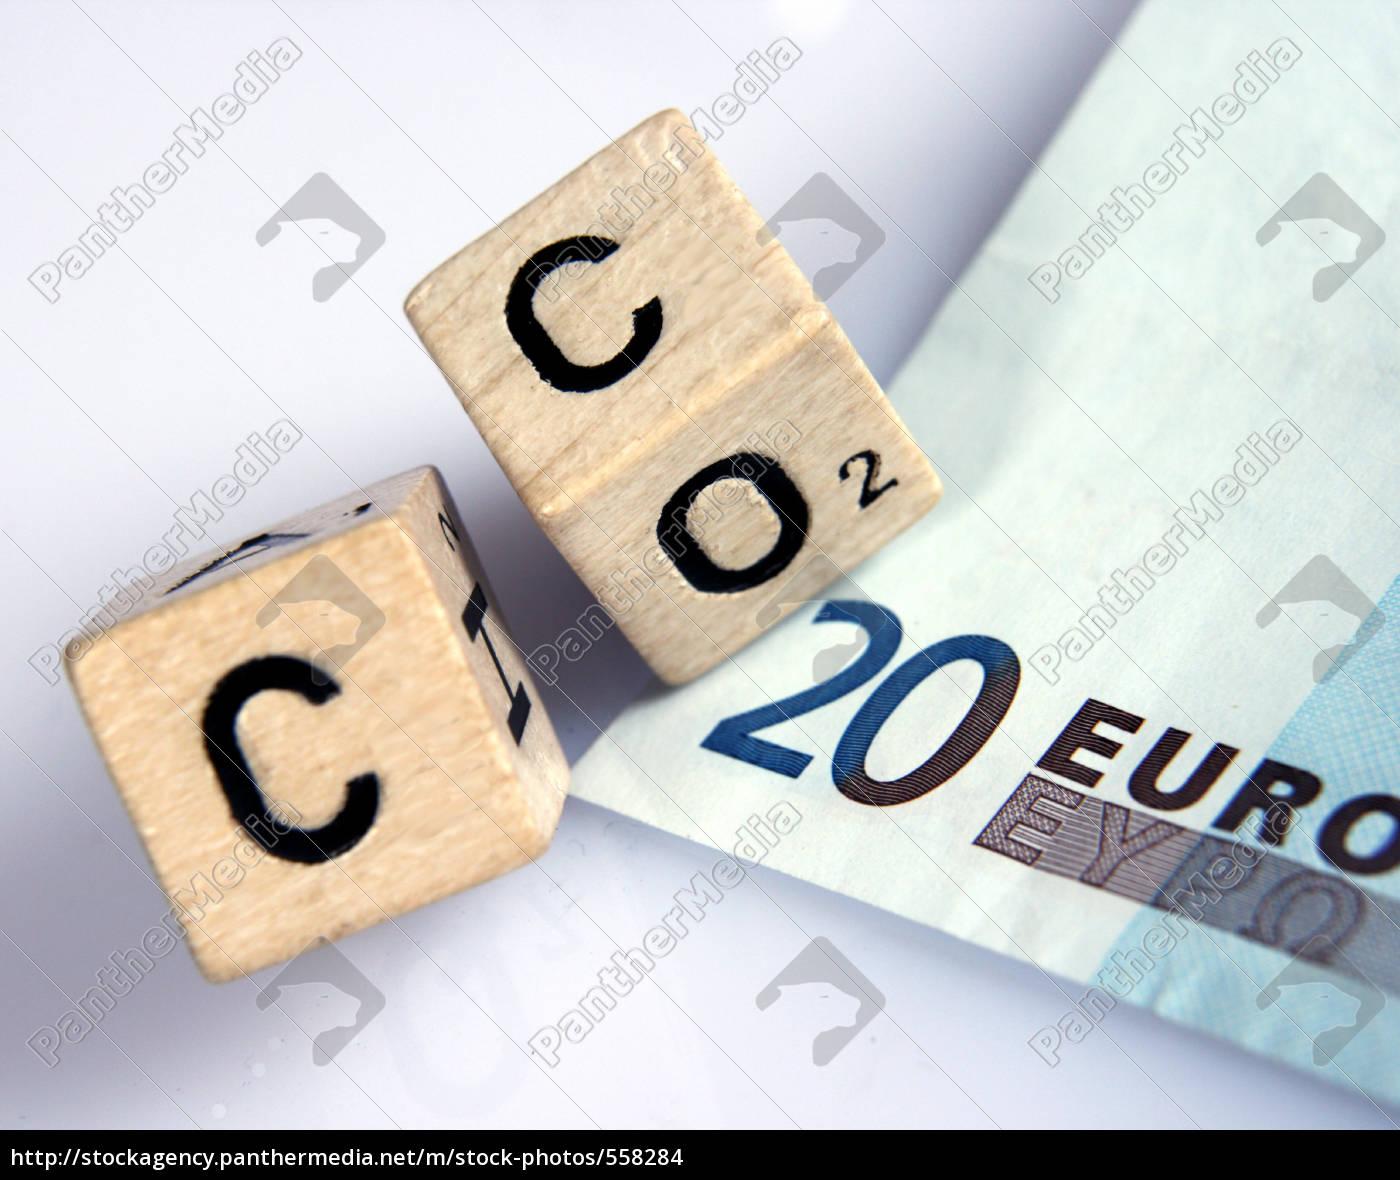 emission, control - 558284